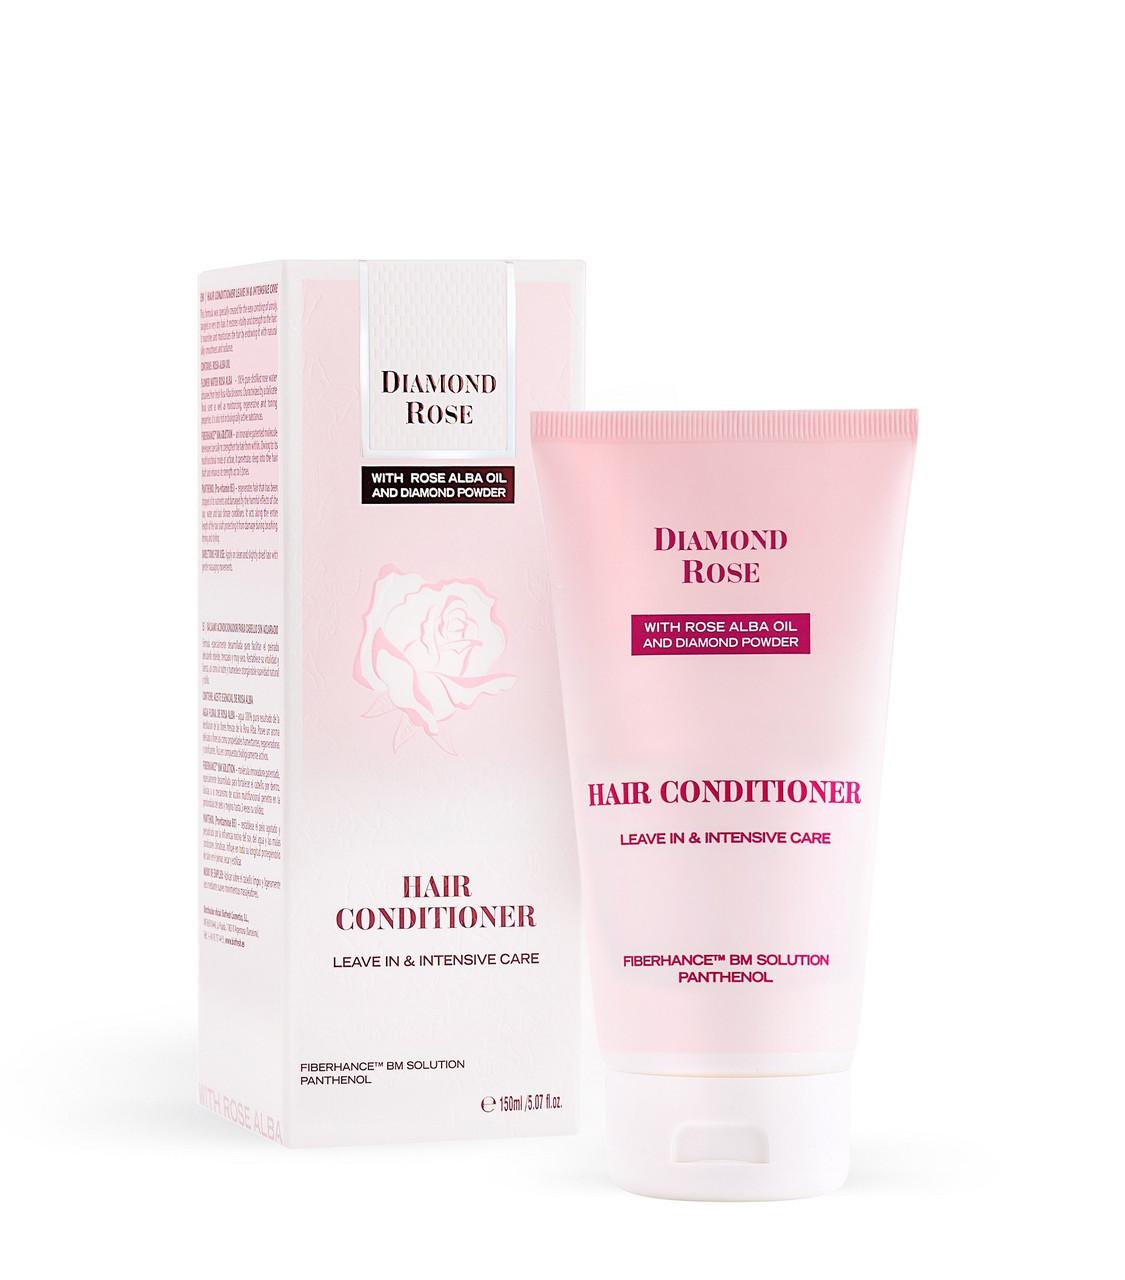 Бальзам для волос интенсивный уход/Hair conditioner leave in & intensive care Diamond Rose